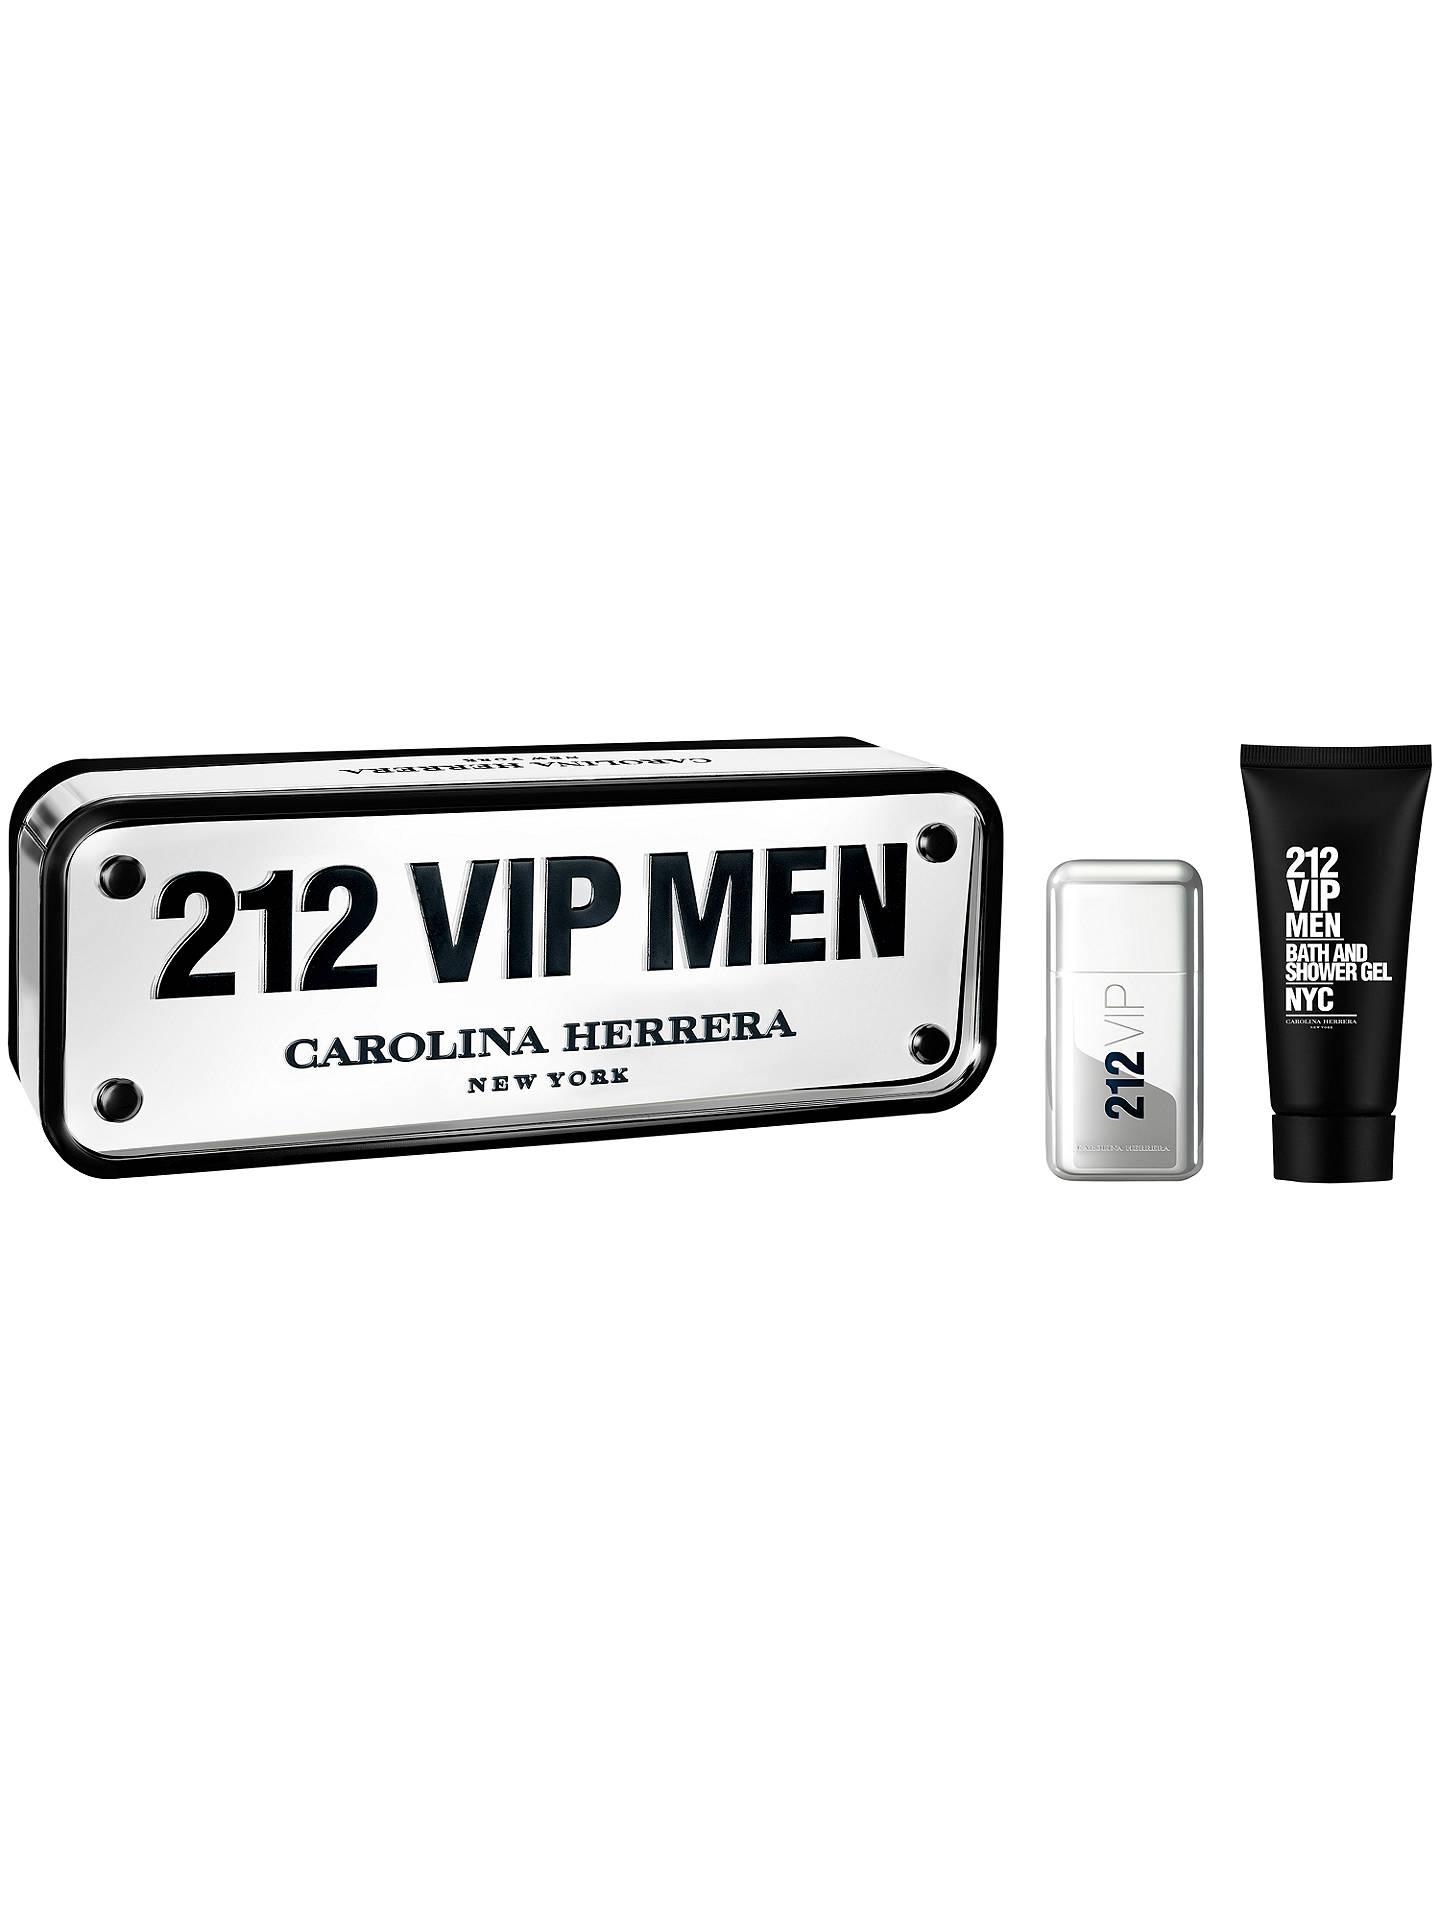 fe44b74c2 Buy Carolina Herrera 212 Vip Men 50ml Eau de Toilette Gift Set Online at  johnlewis.